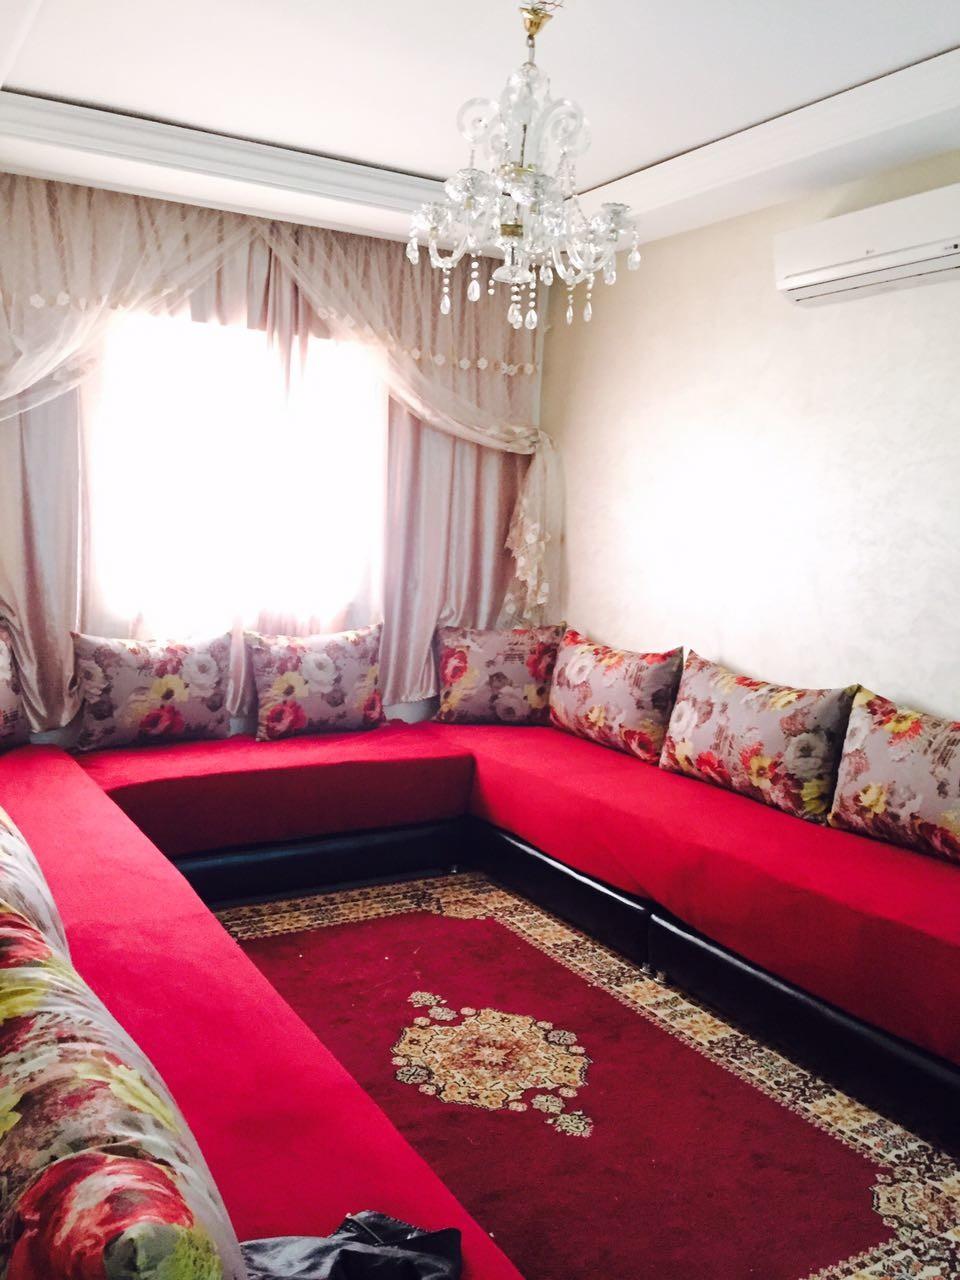 Location <strong>Appartement</strong> Marrakech Targa <strong>60 m2</strong>